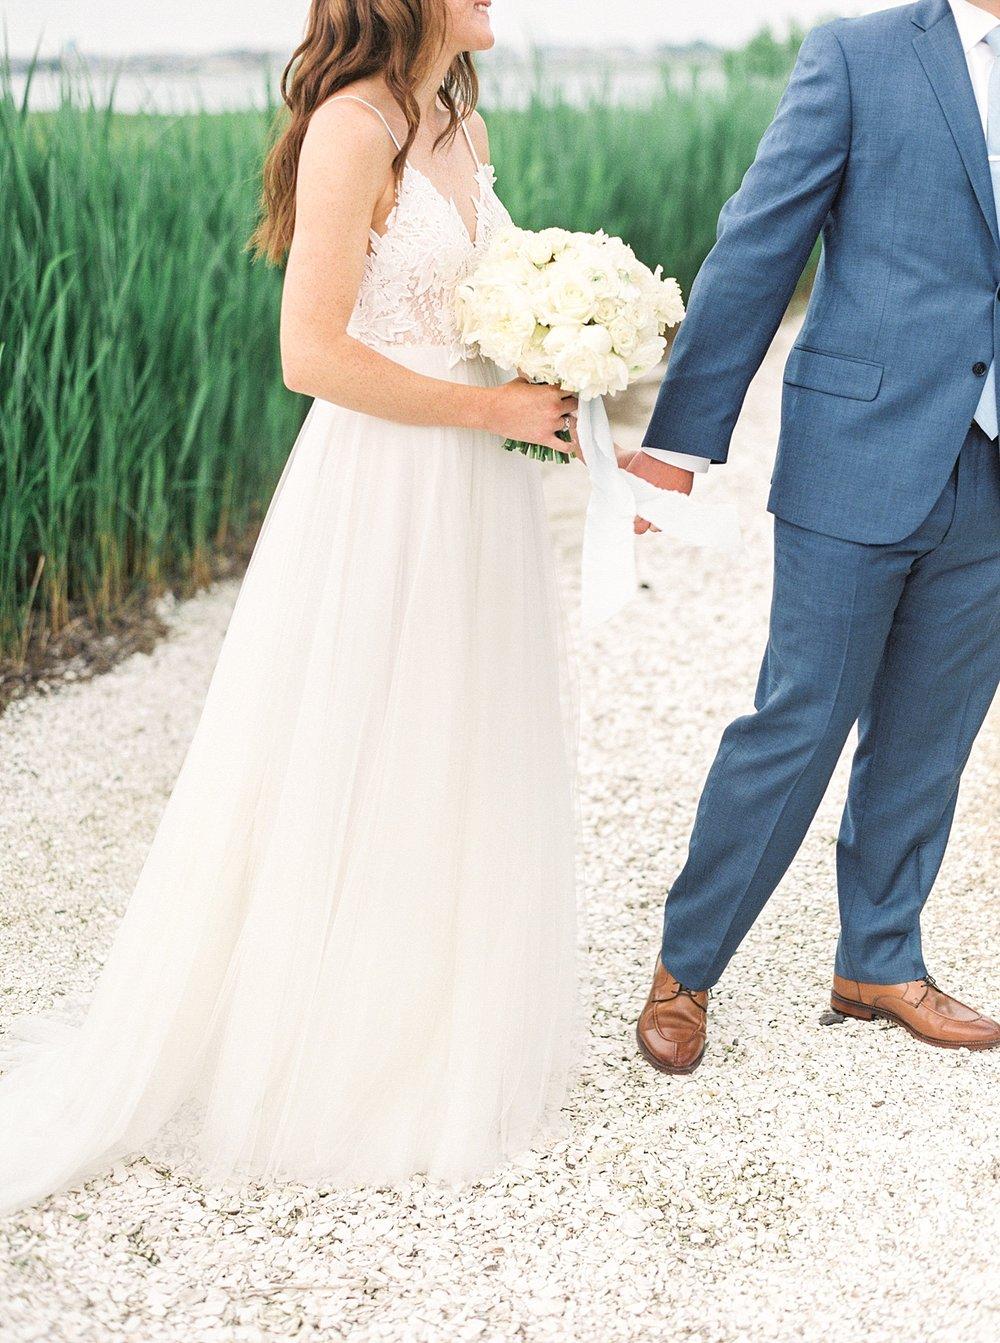 bonnet_island_estate_lbi_nj_wedding_photos_0032.jpg